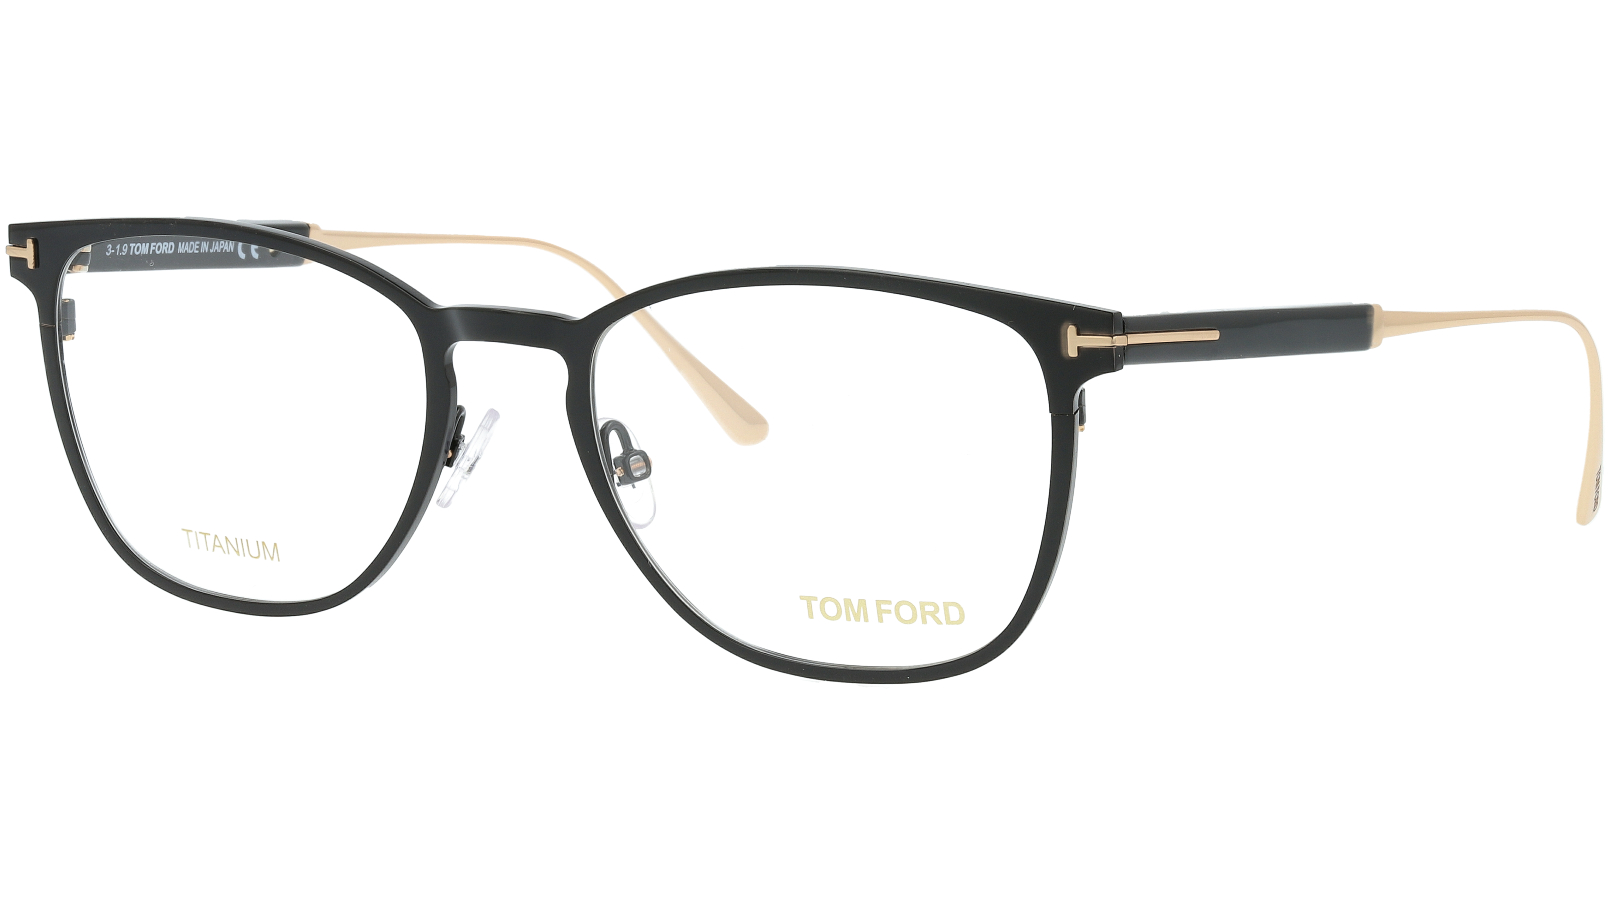 Tom Ford TF5483 001 52 Black Titanium Glasses